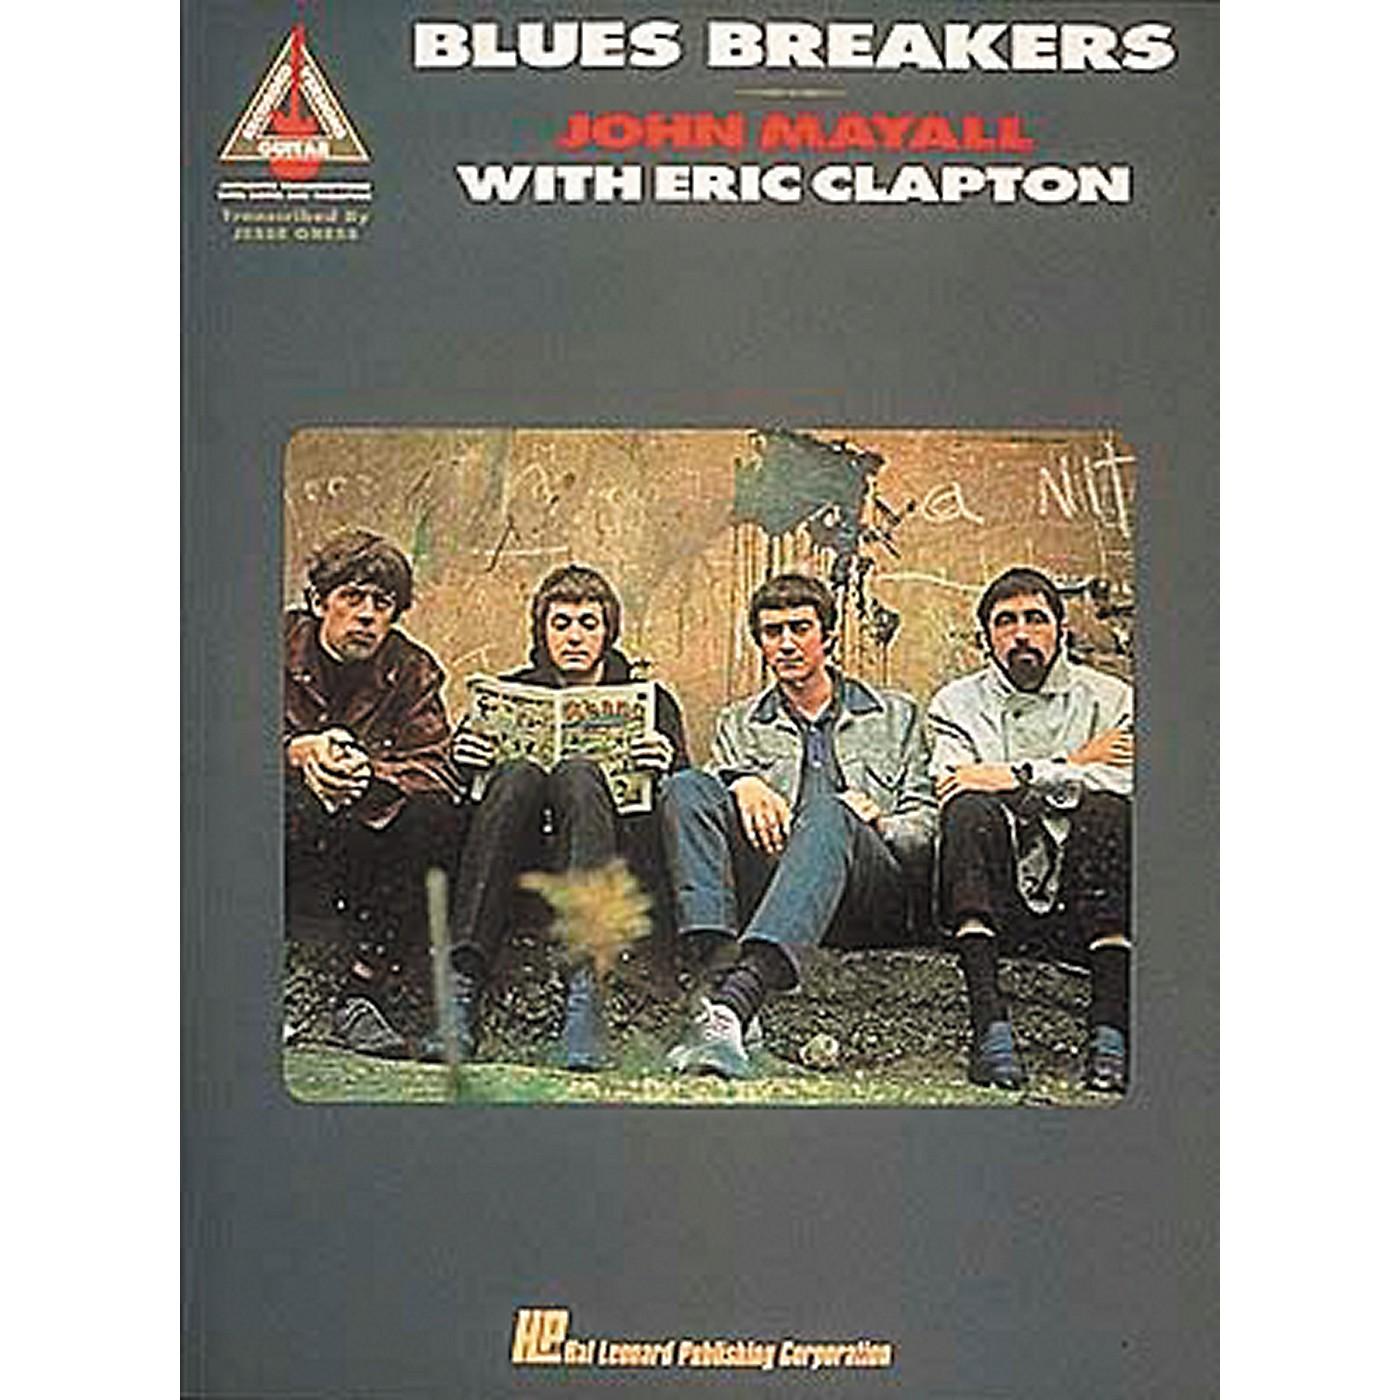 Hal Leonard Blues Breakers John Mayall with Eric Clapton Guitar Tab Songbook thumbnail